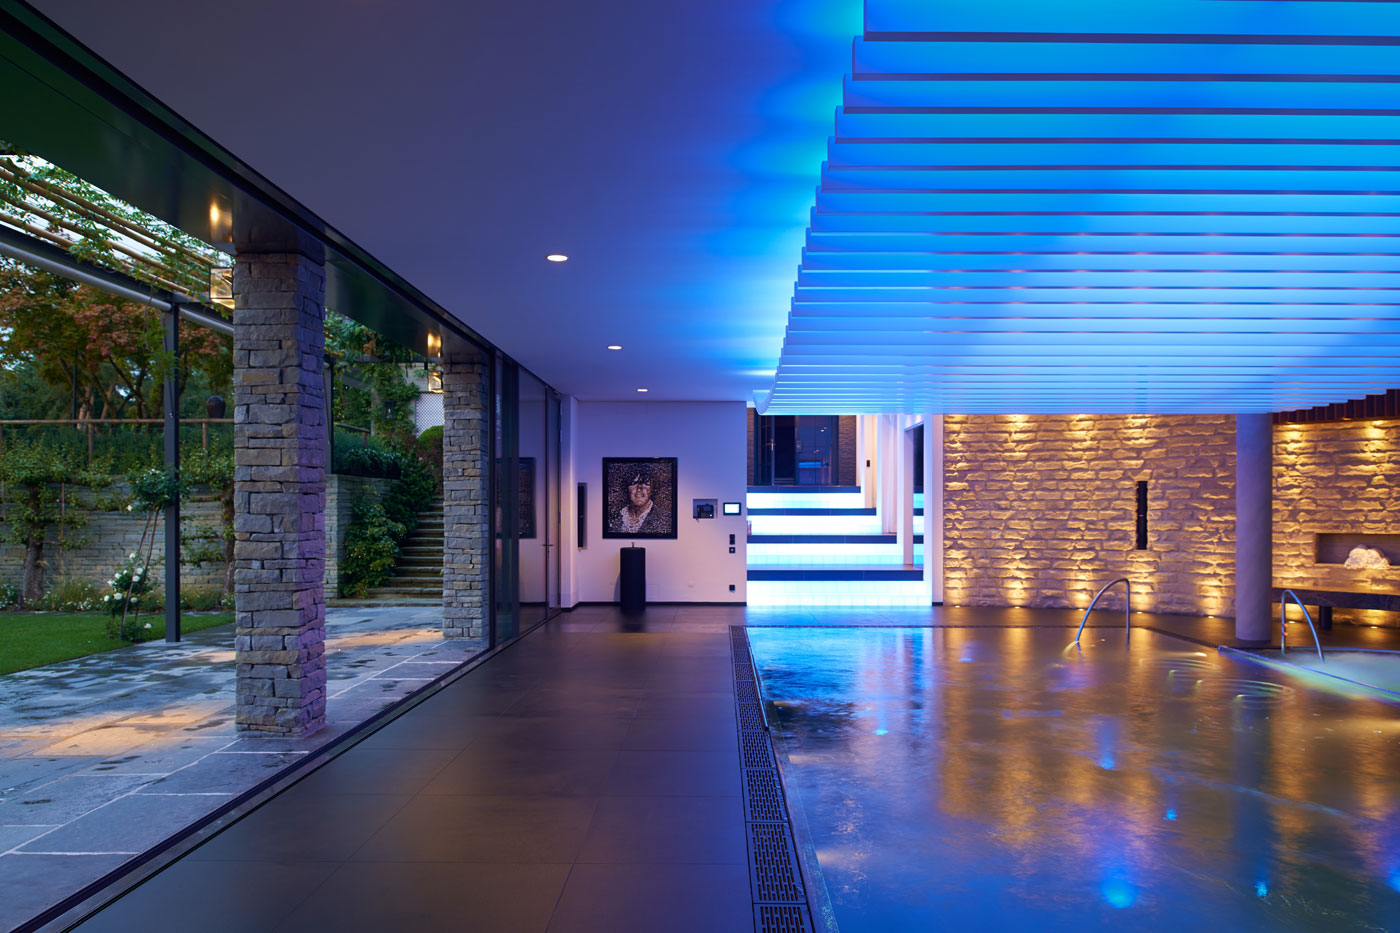 Private property tobias link lighting designer